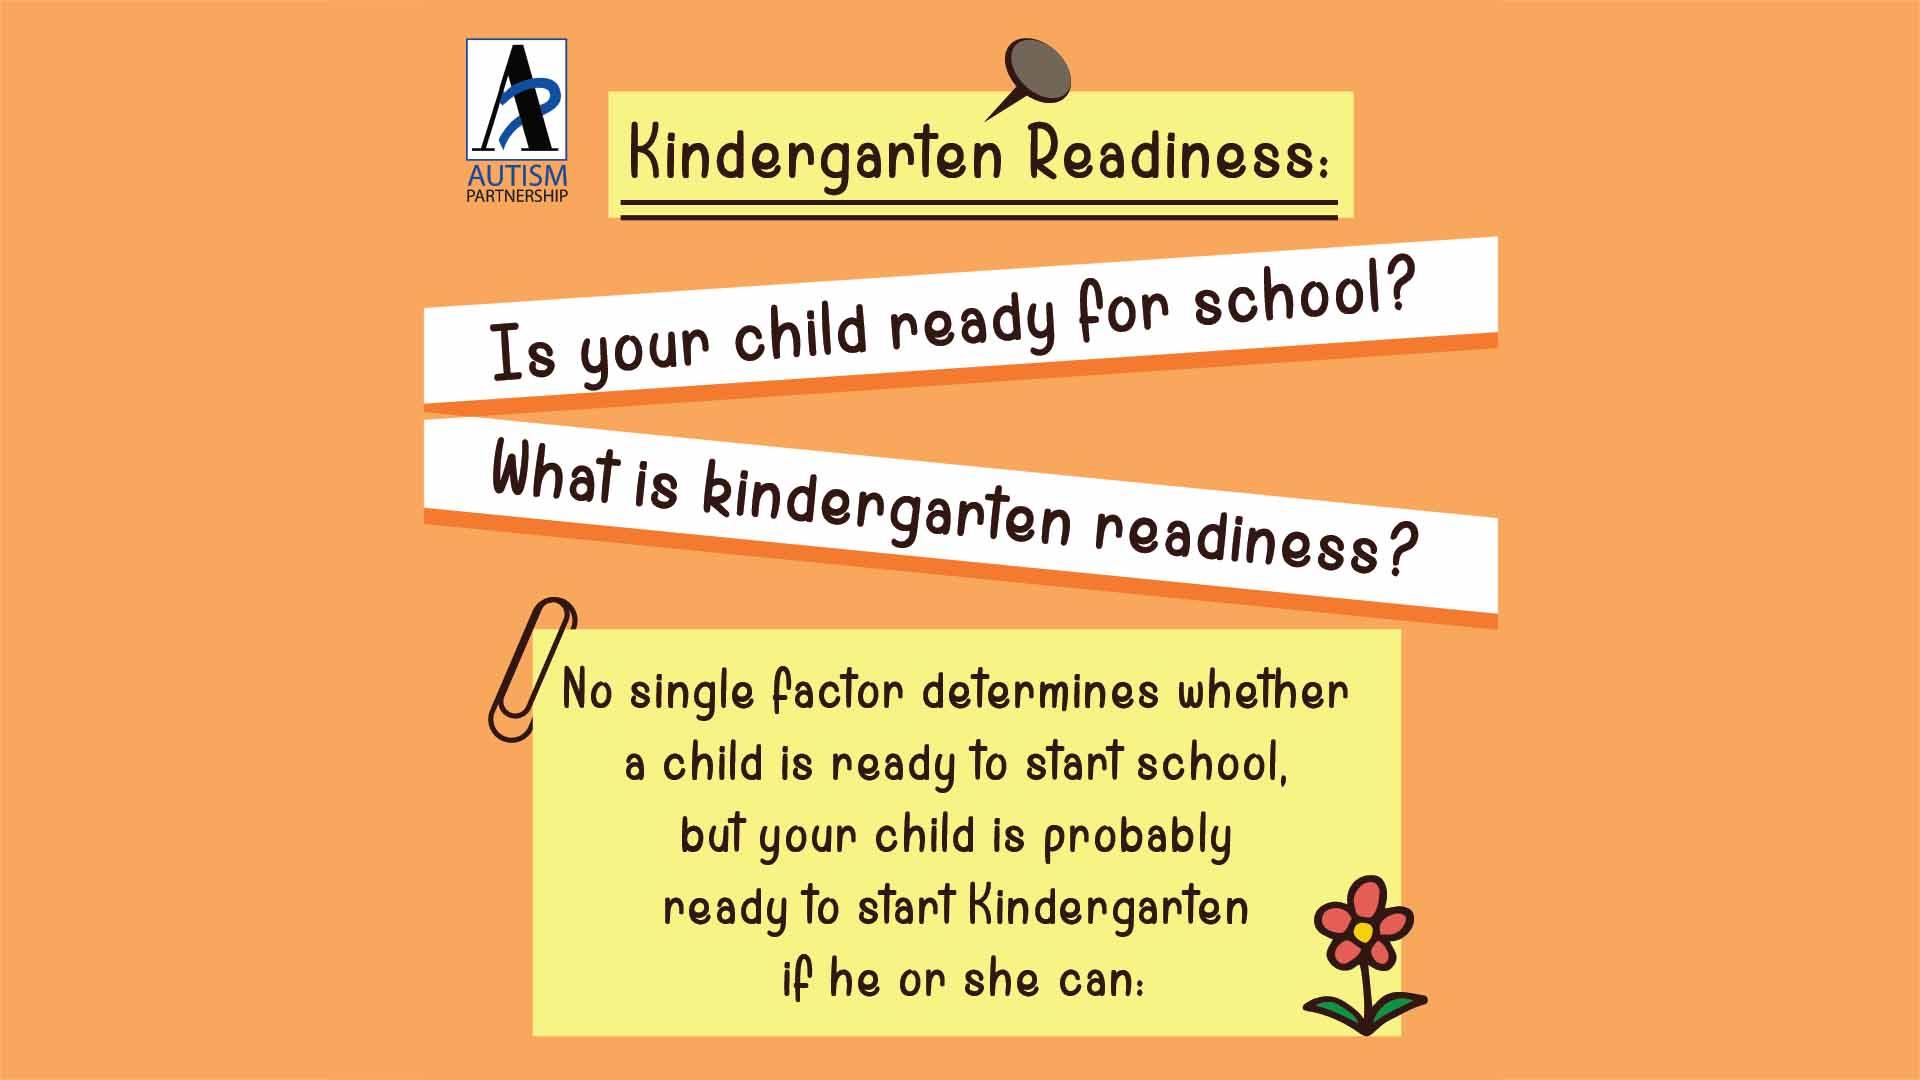 autism-partnership-kindergarten-readiness